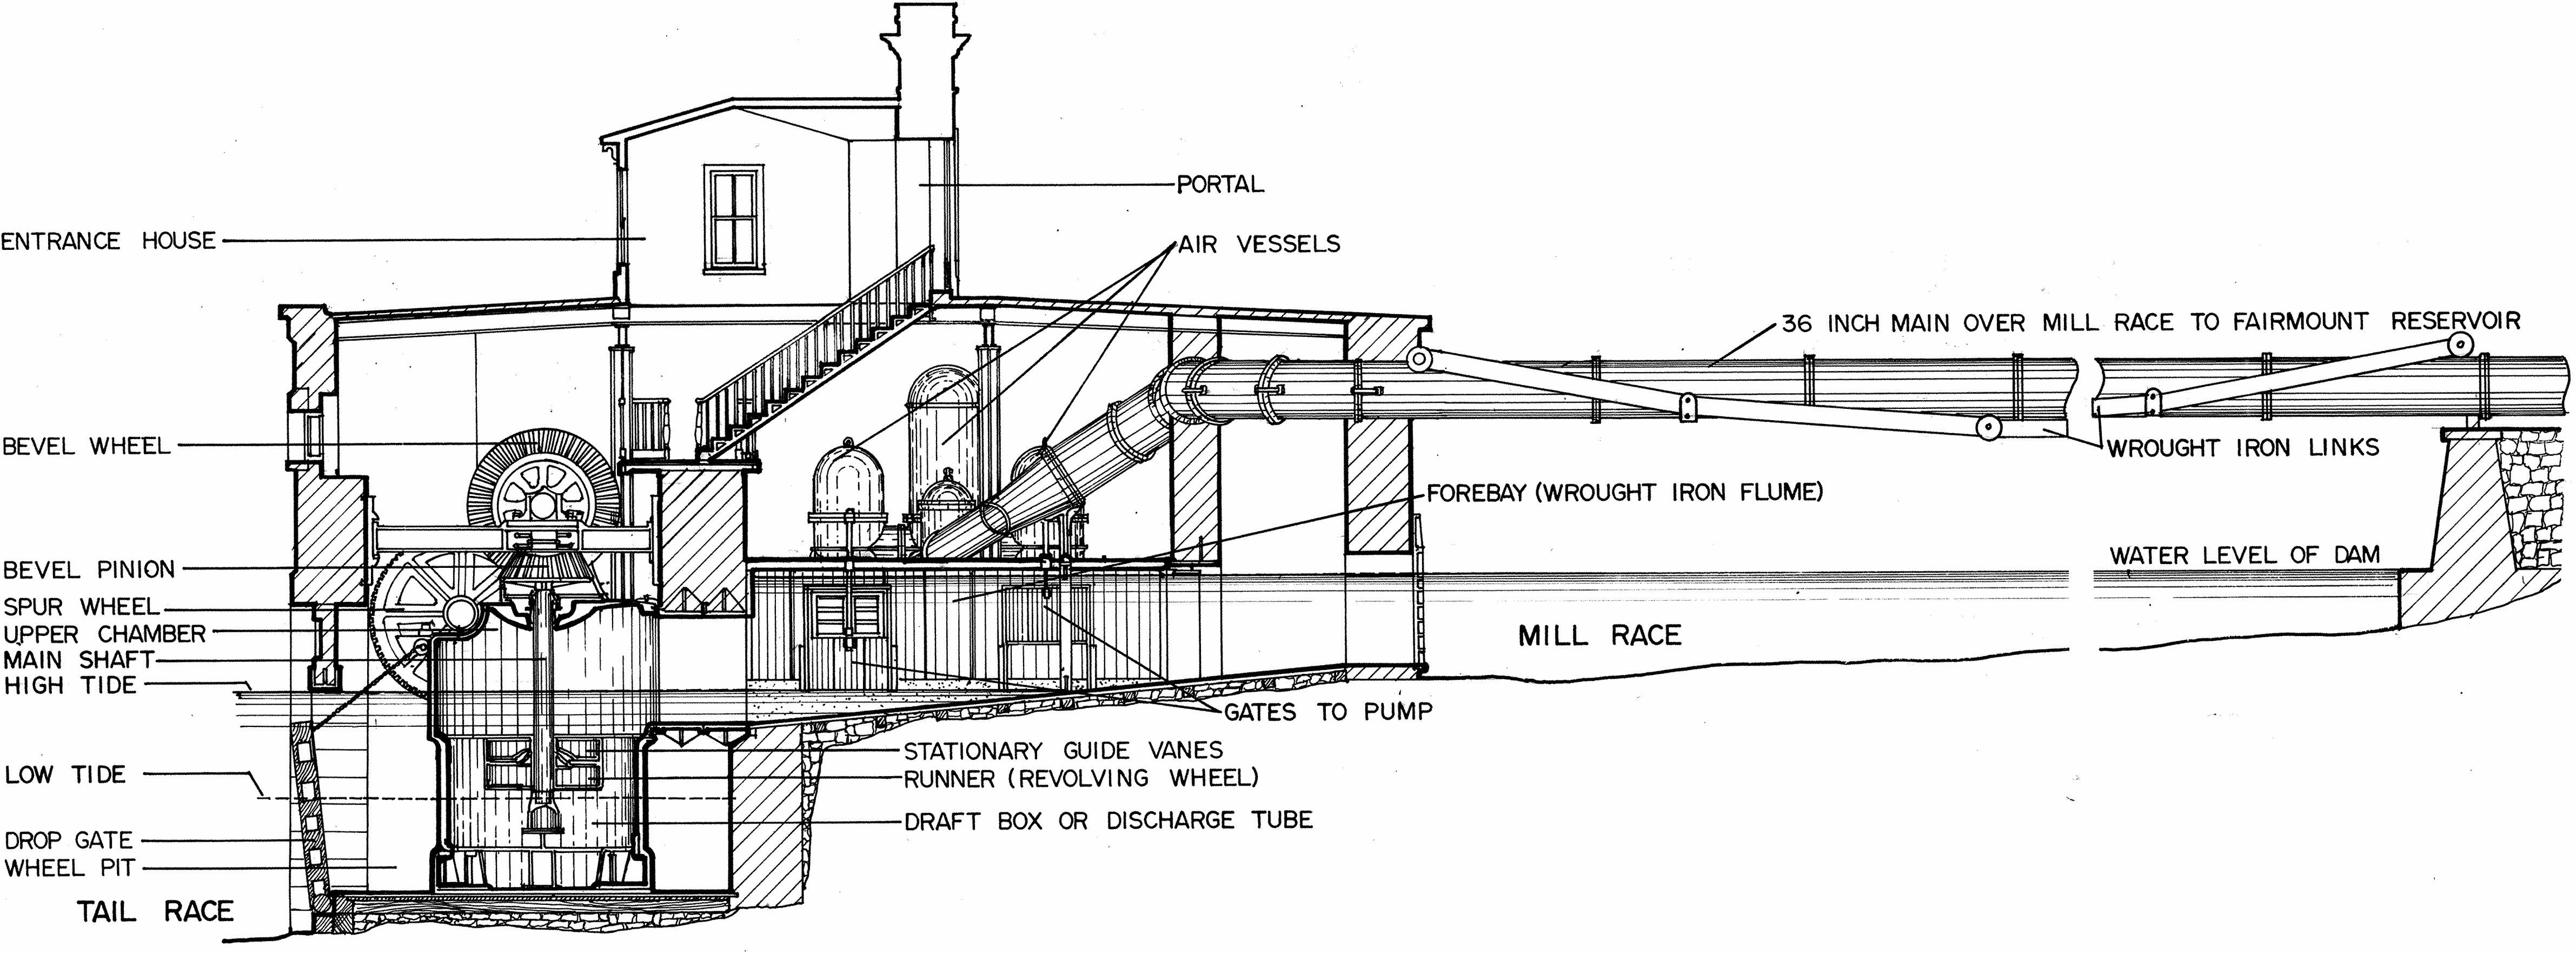 File:Fairmount Water Works Jonval Turbine Cutaway.png ...